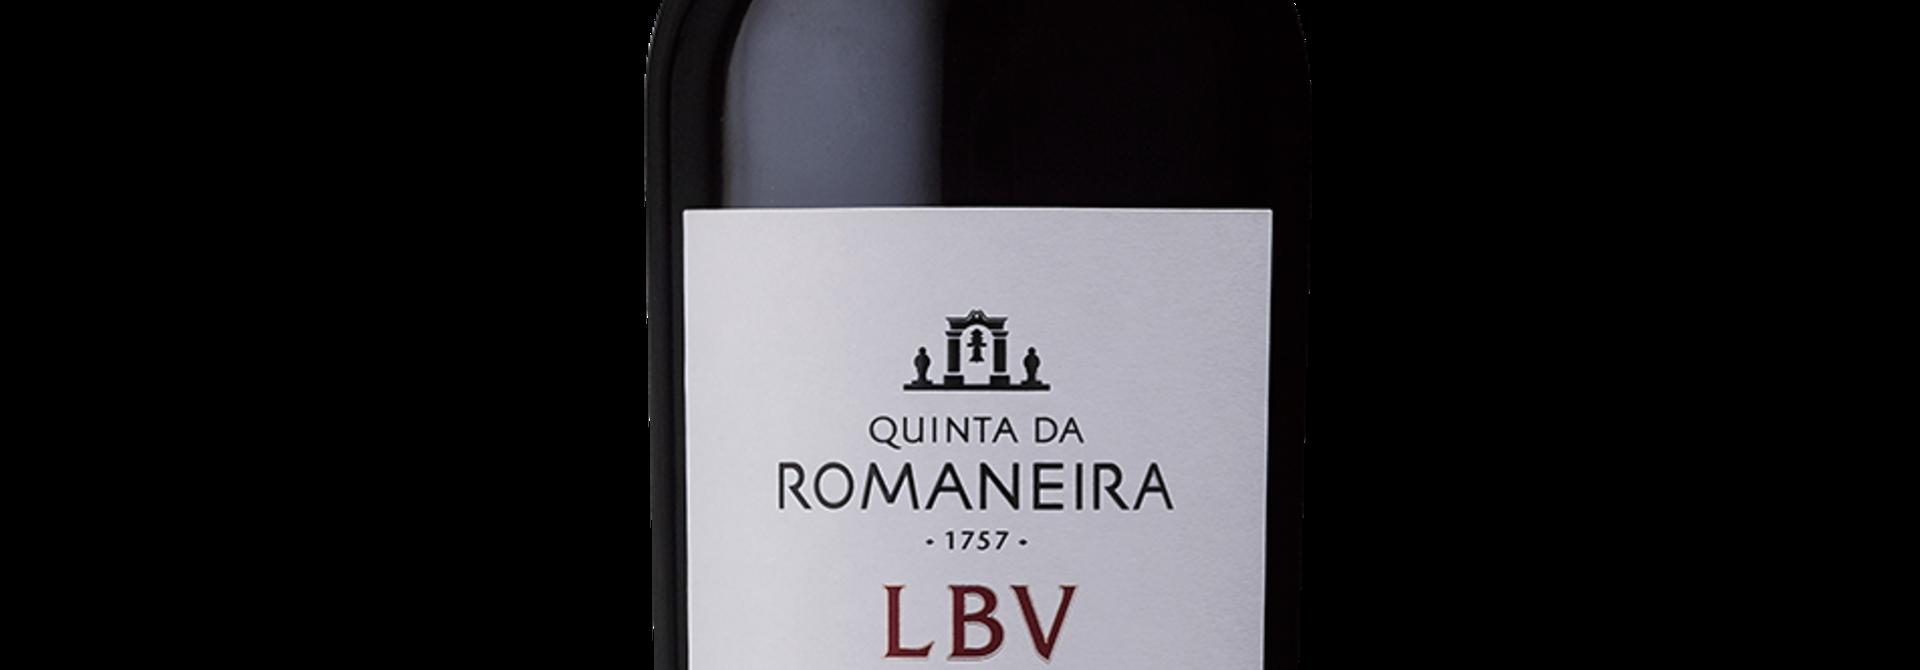 Quinta da Romaneira LBV Port unfiltered 2014